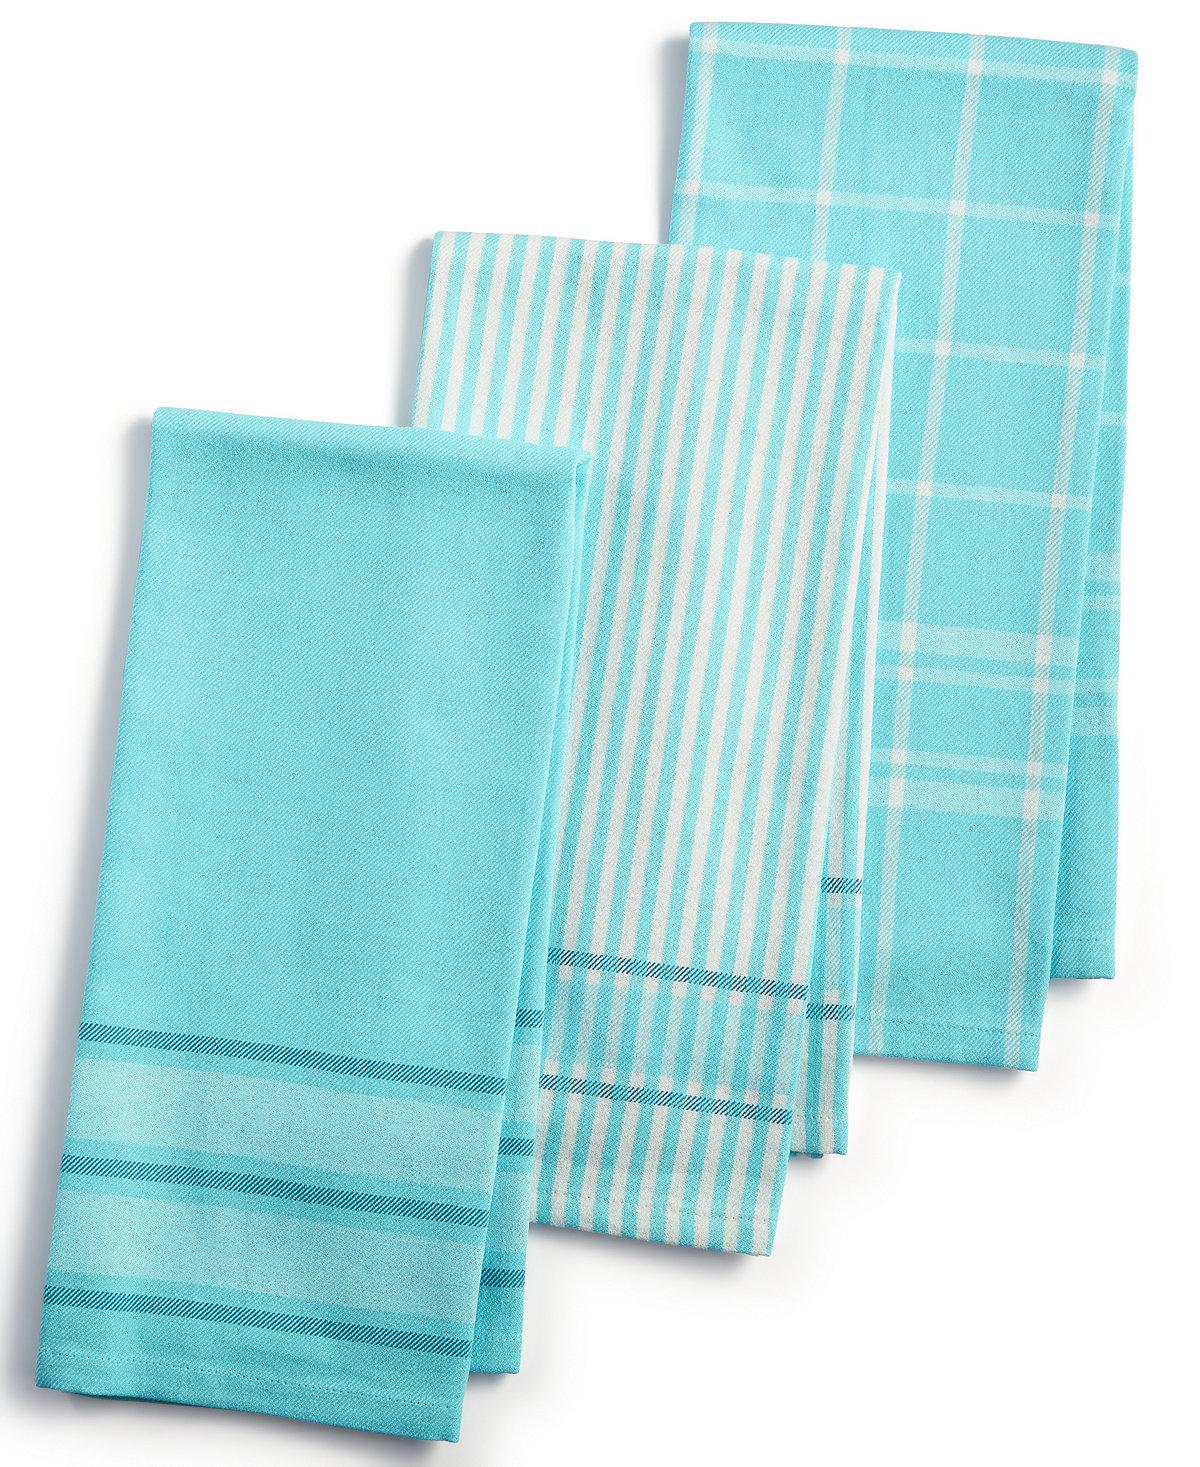 martha stewart kitchen towels small appliance 3 pc jacquard striped cotton everything